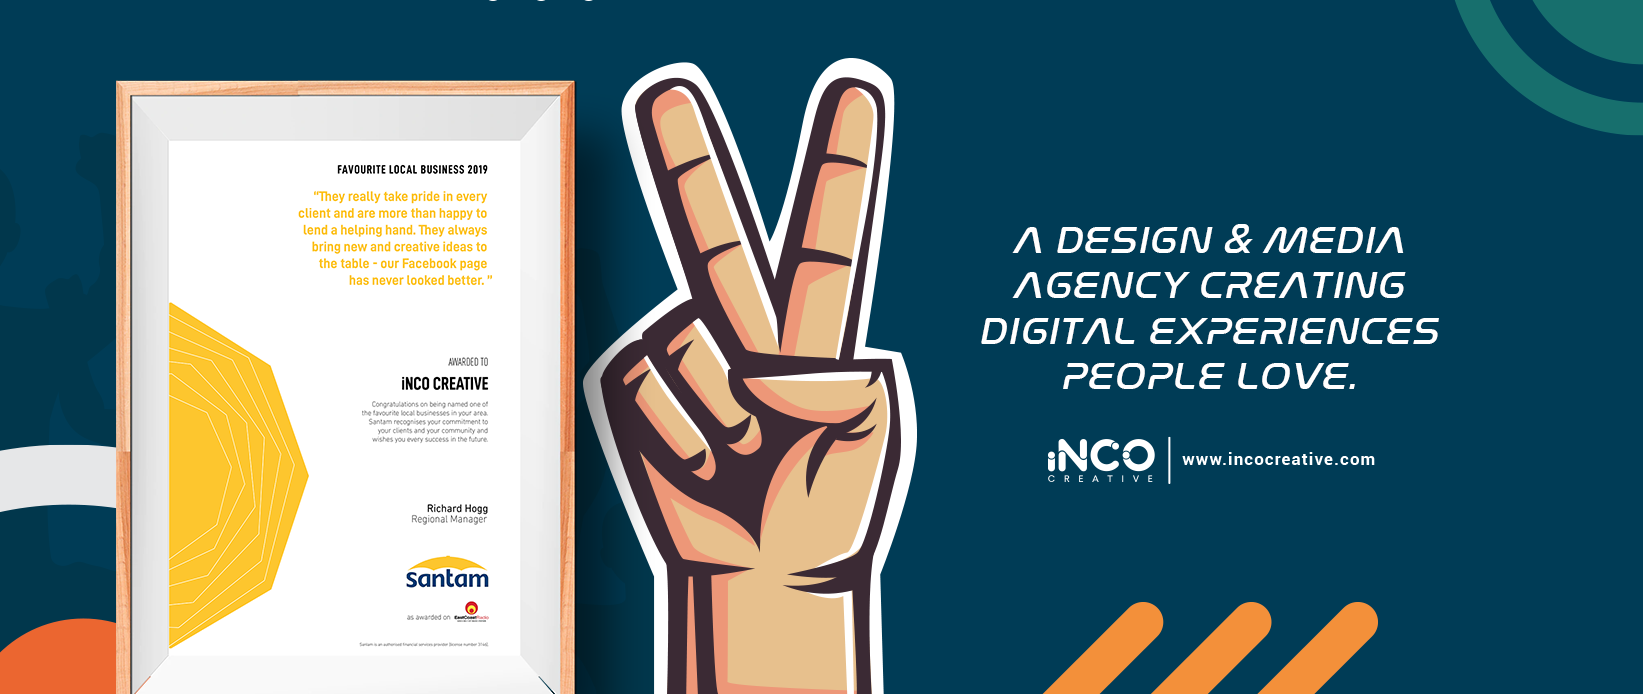 iNCO Creative - Digital Marketing Agency